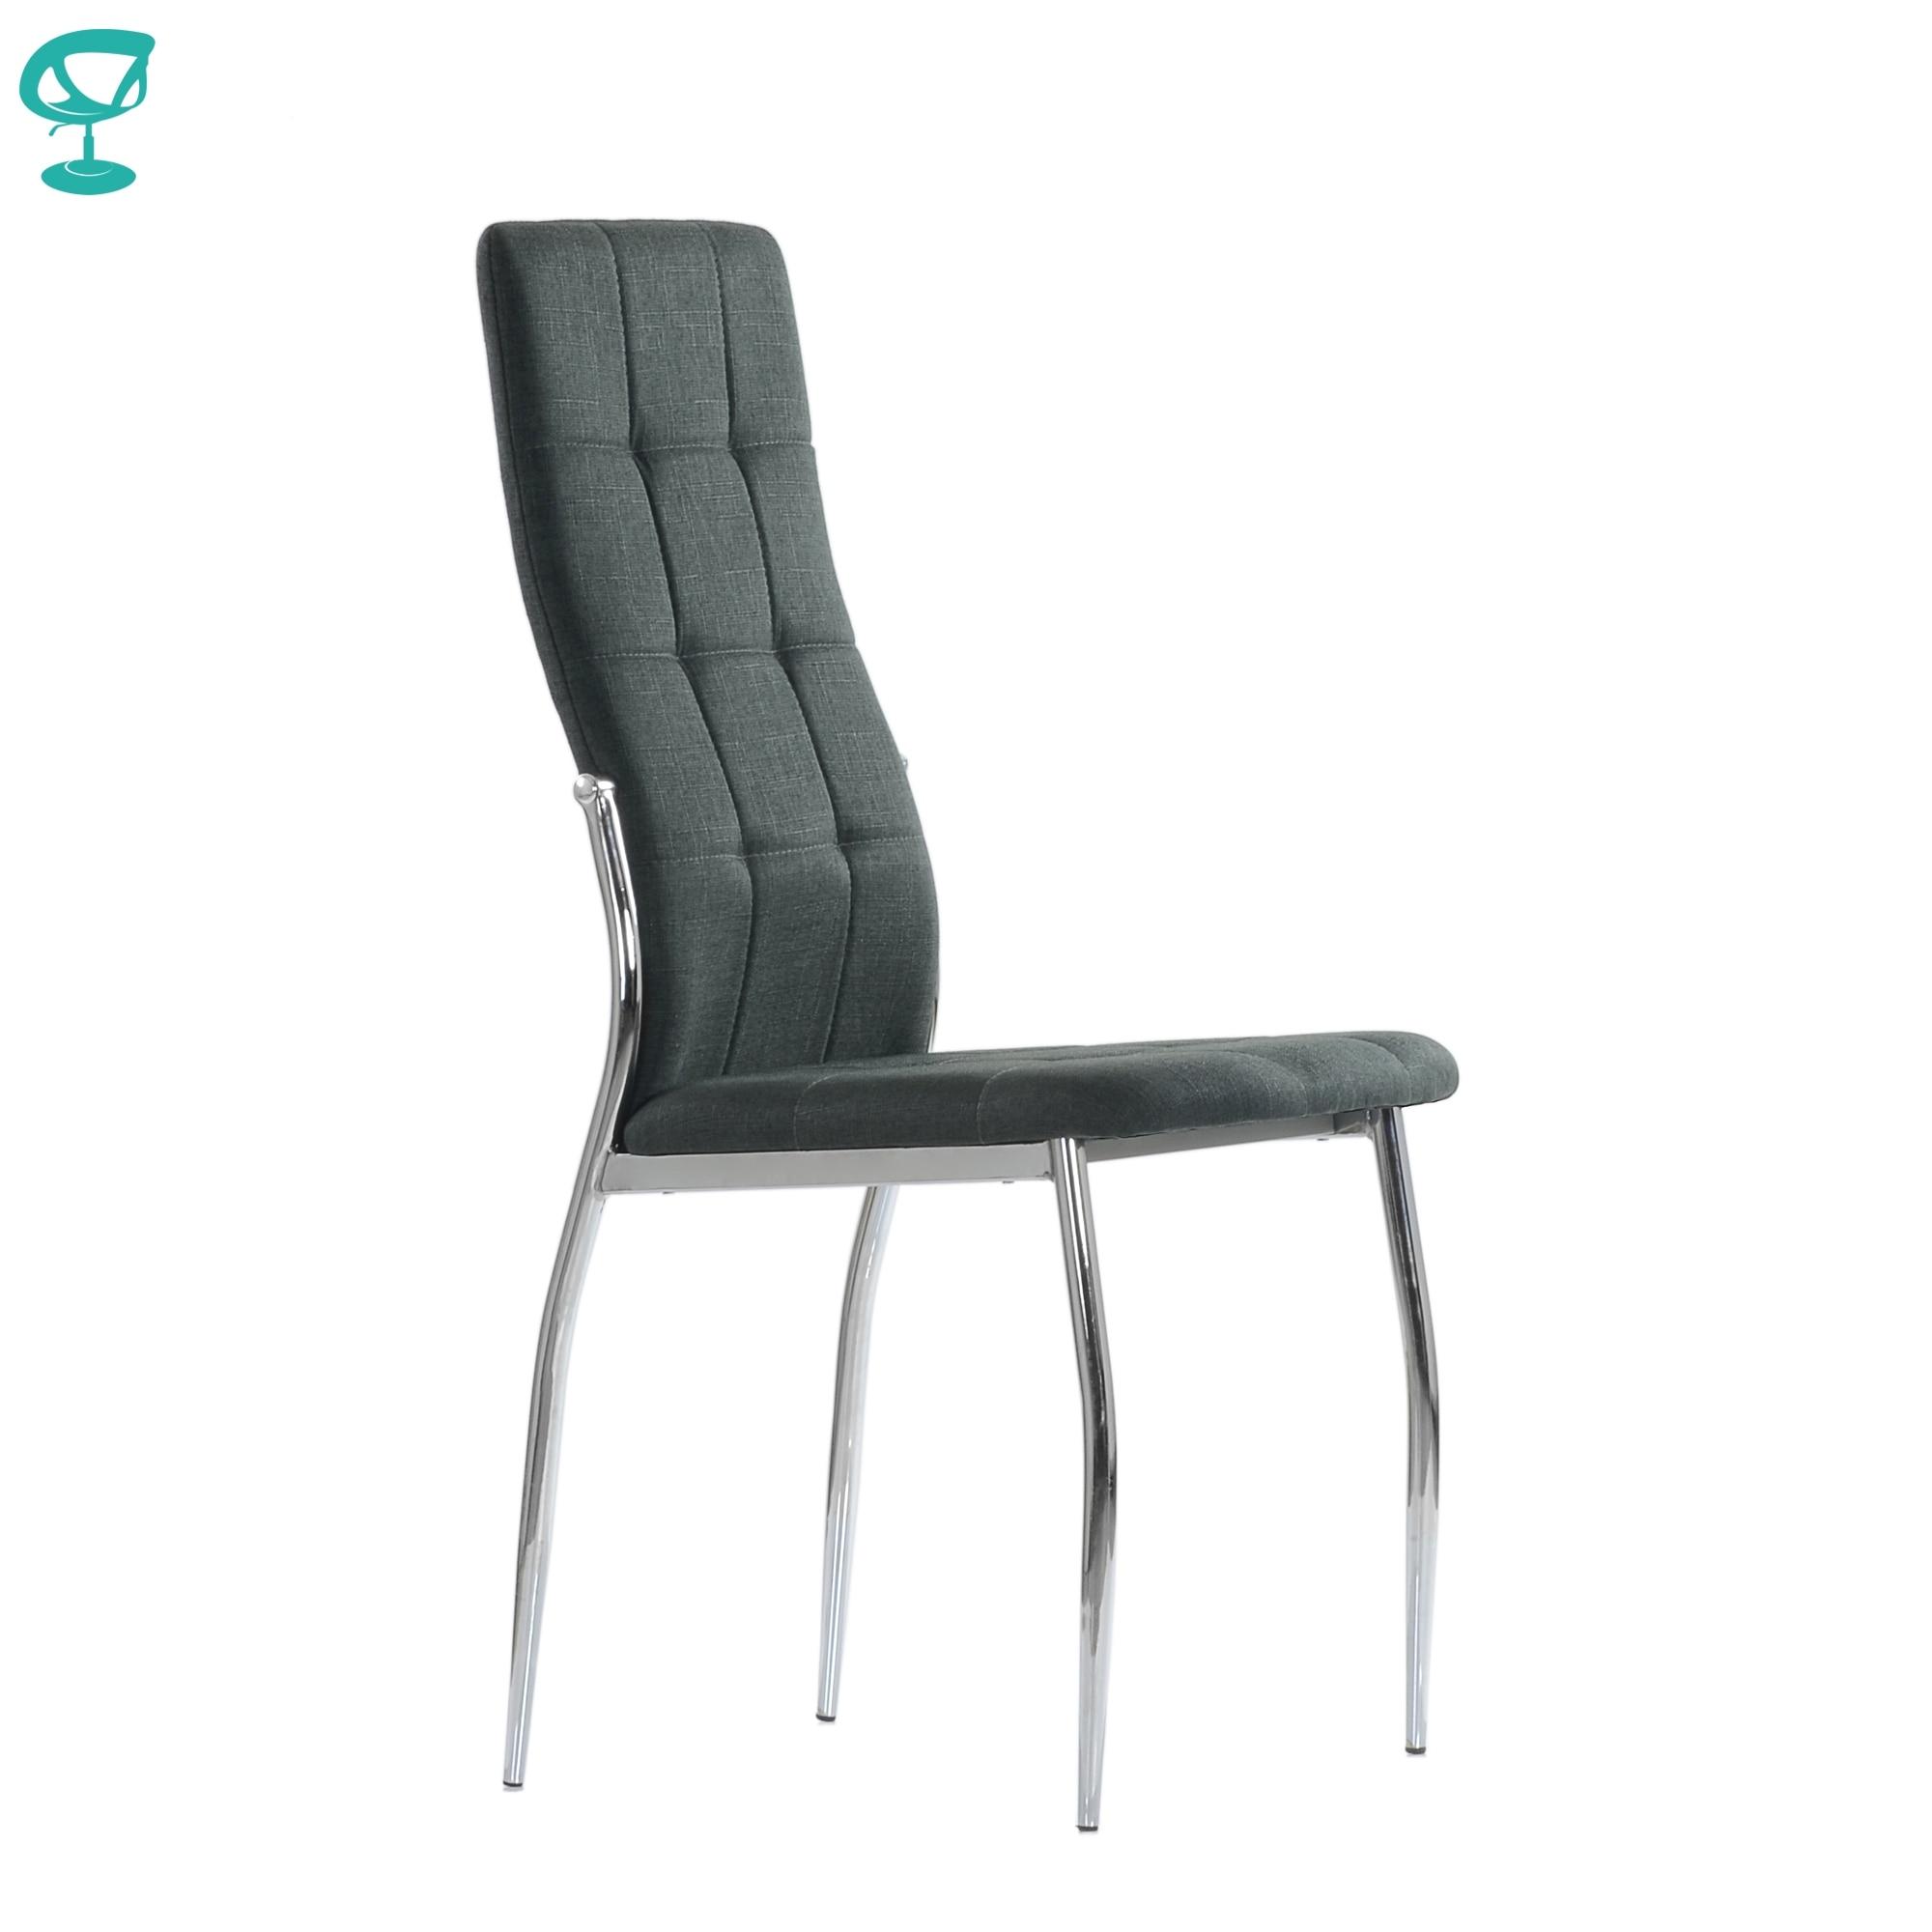 95729 Barneo S-68 Chair Table Soft сидением Dark Gray Fabric Chair Kitchen Chair For Coffee Shop Chair For Restaurant Feet Chrome